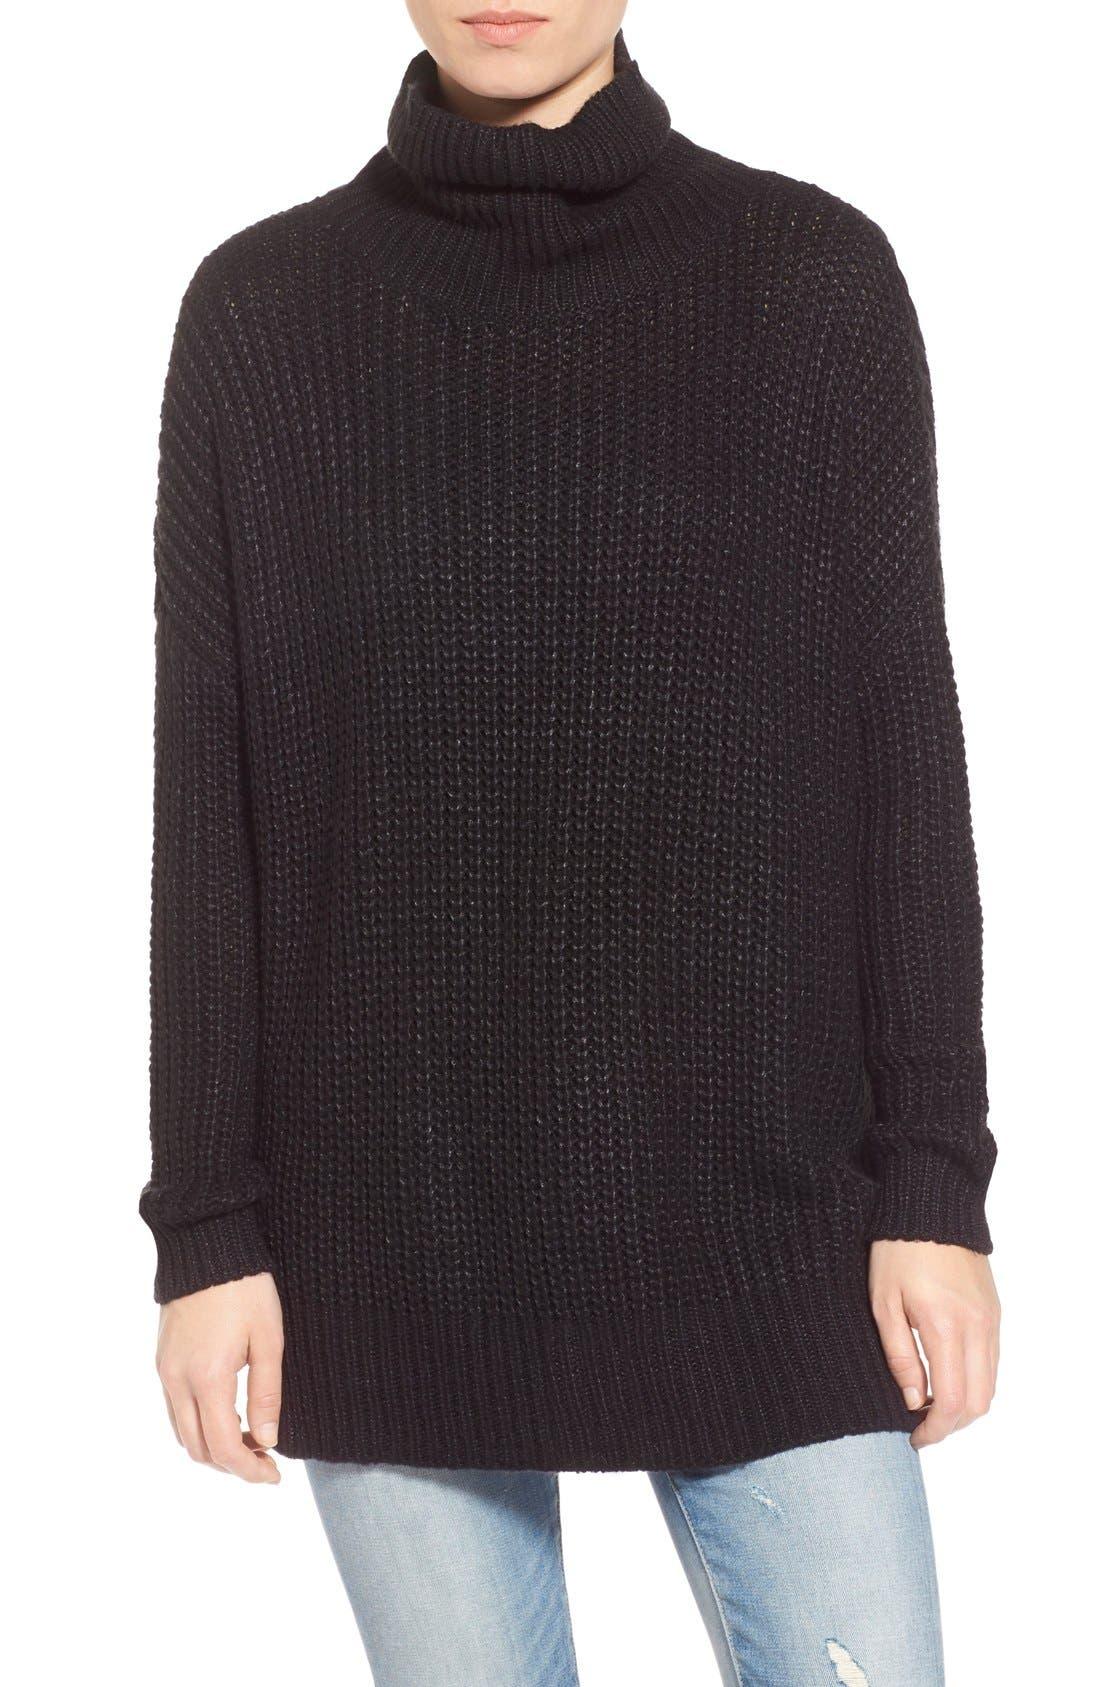 Oversize Turtleneck Sweater,                             Main thumbnail 1, color,                             001